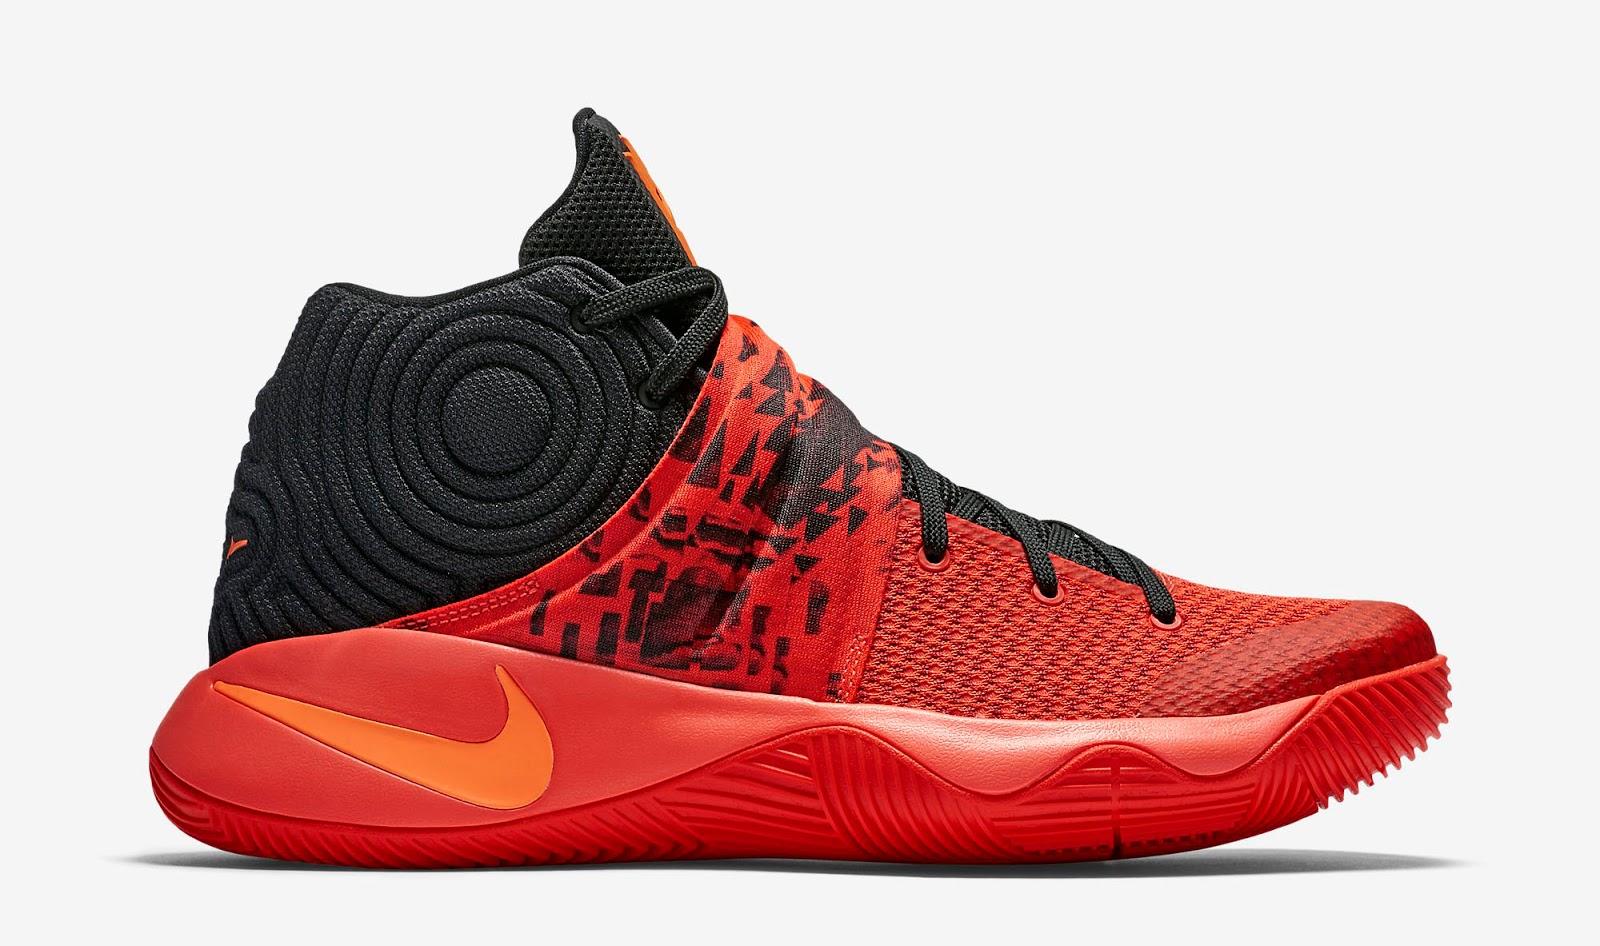 new products 13e1d 1a40b 01 01 2016 Nike LeBron 13